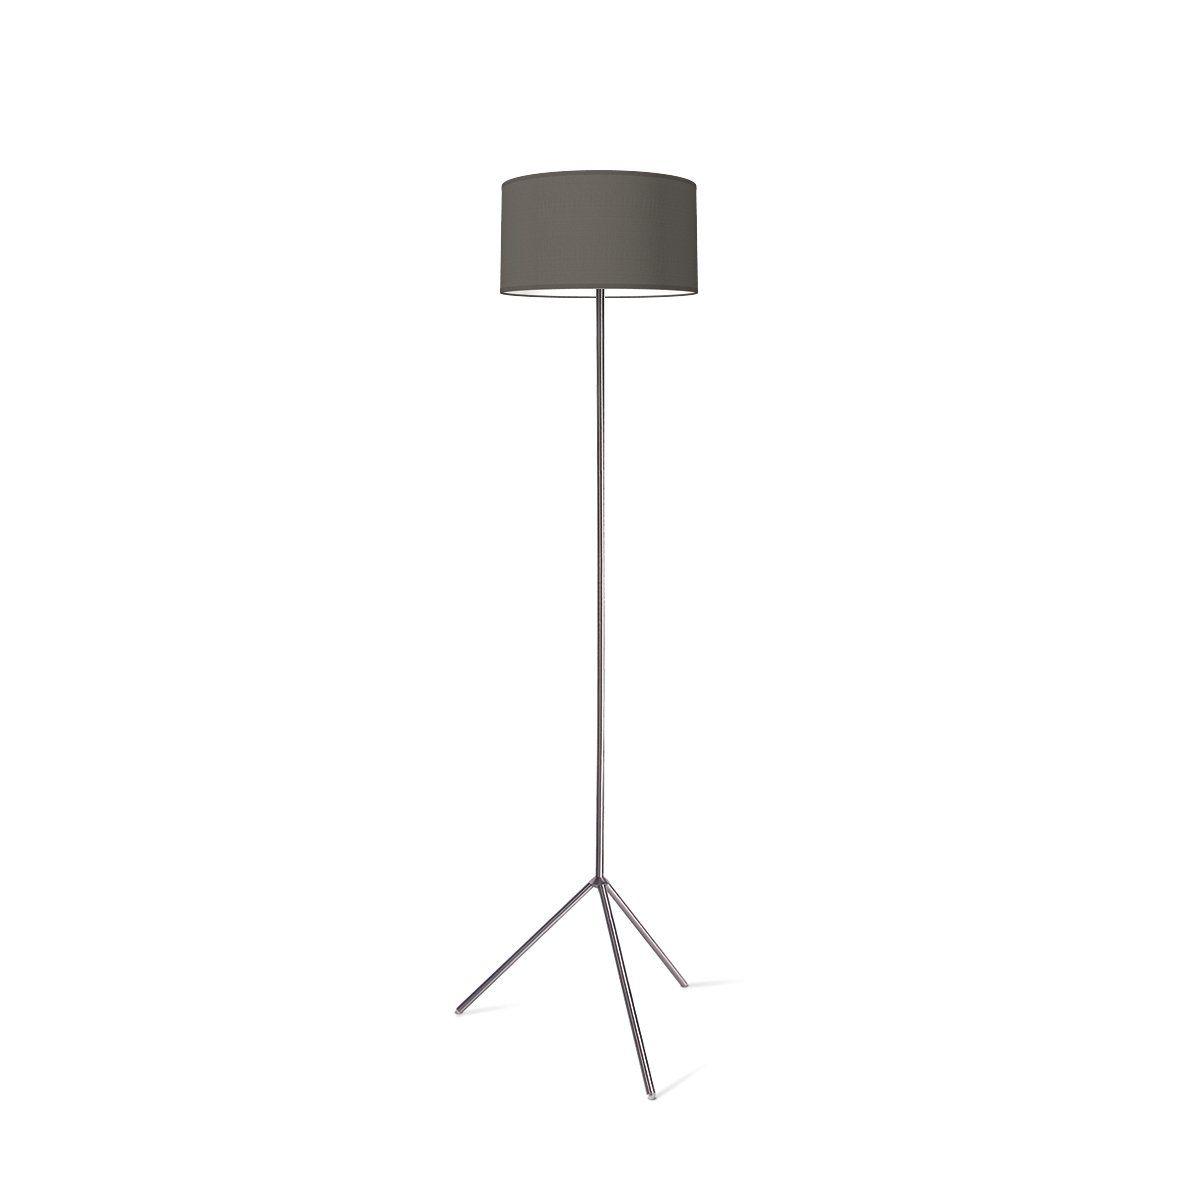 vloerlamp karma bling Ø 40 cm - antraciet